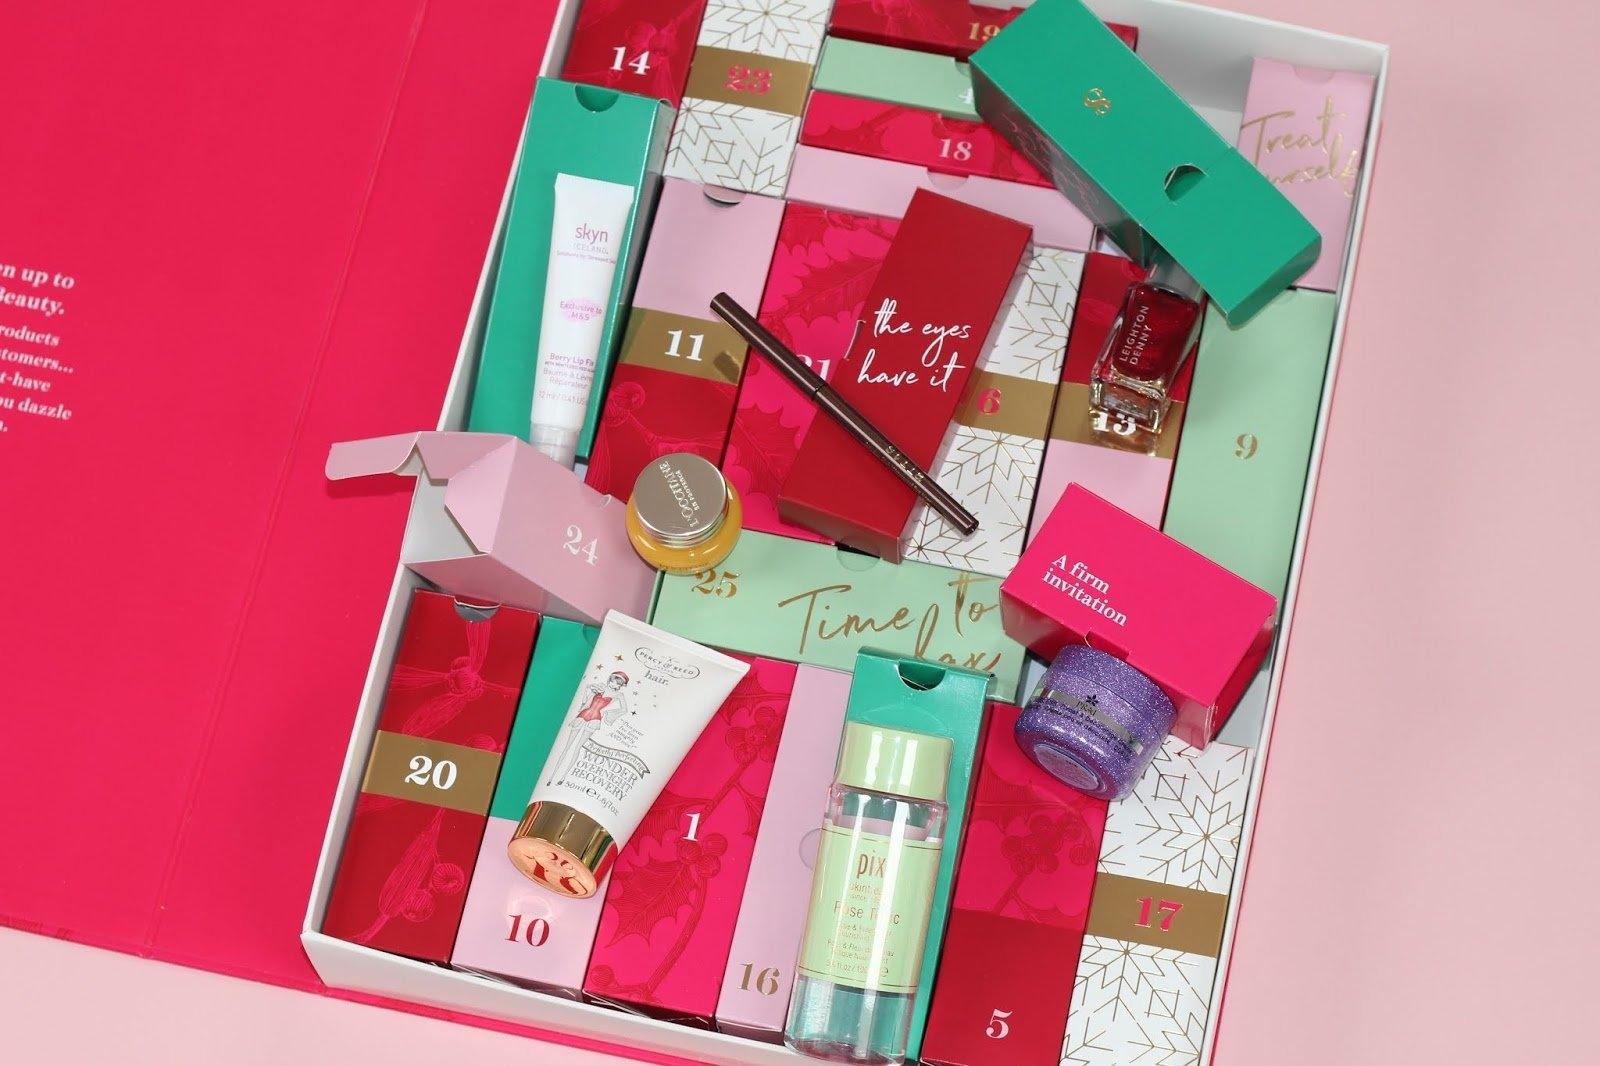 Marks And Spencer Beauty Advent Calendar 2018 Contents! | Pink M&s Beauty Advent Calendar 2019